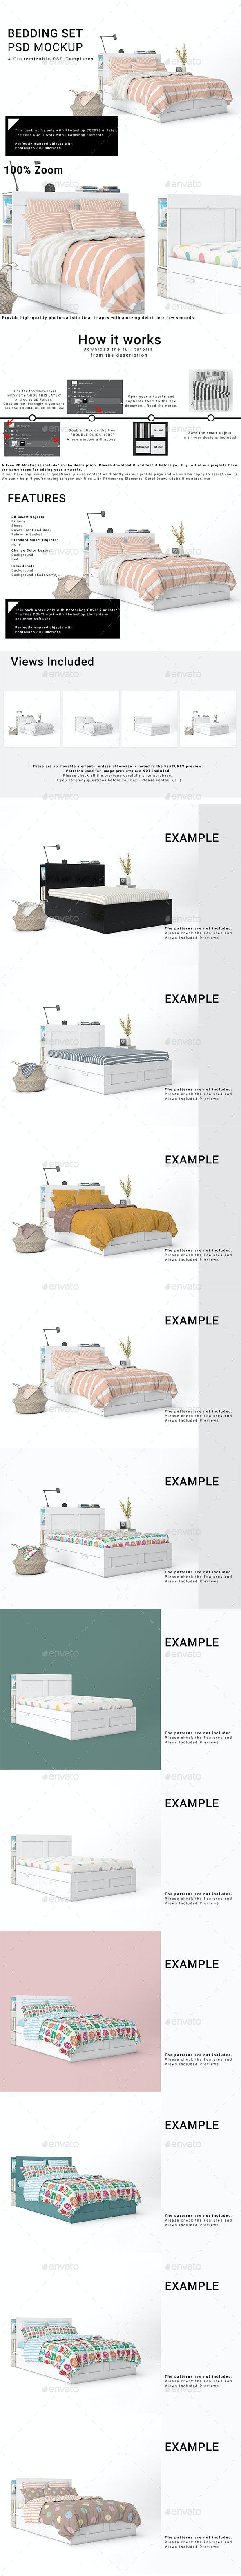 Bed Linens Mockup Set - Print Product Mock-Ups